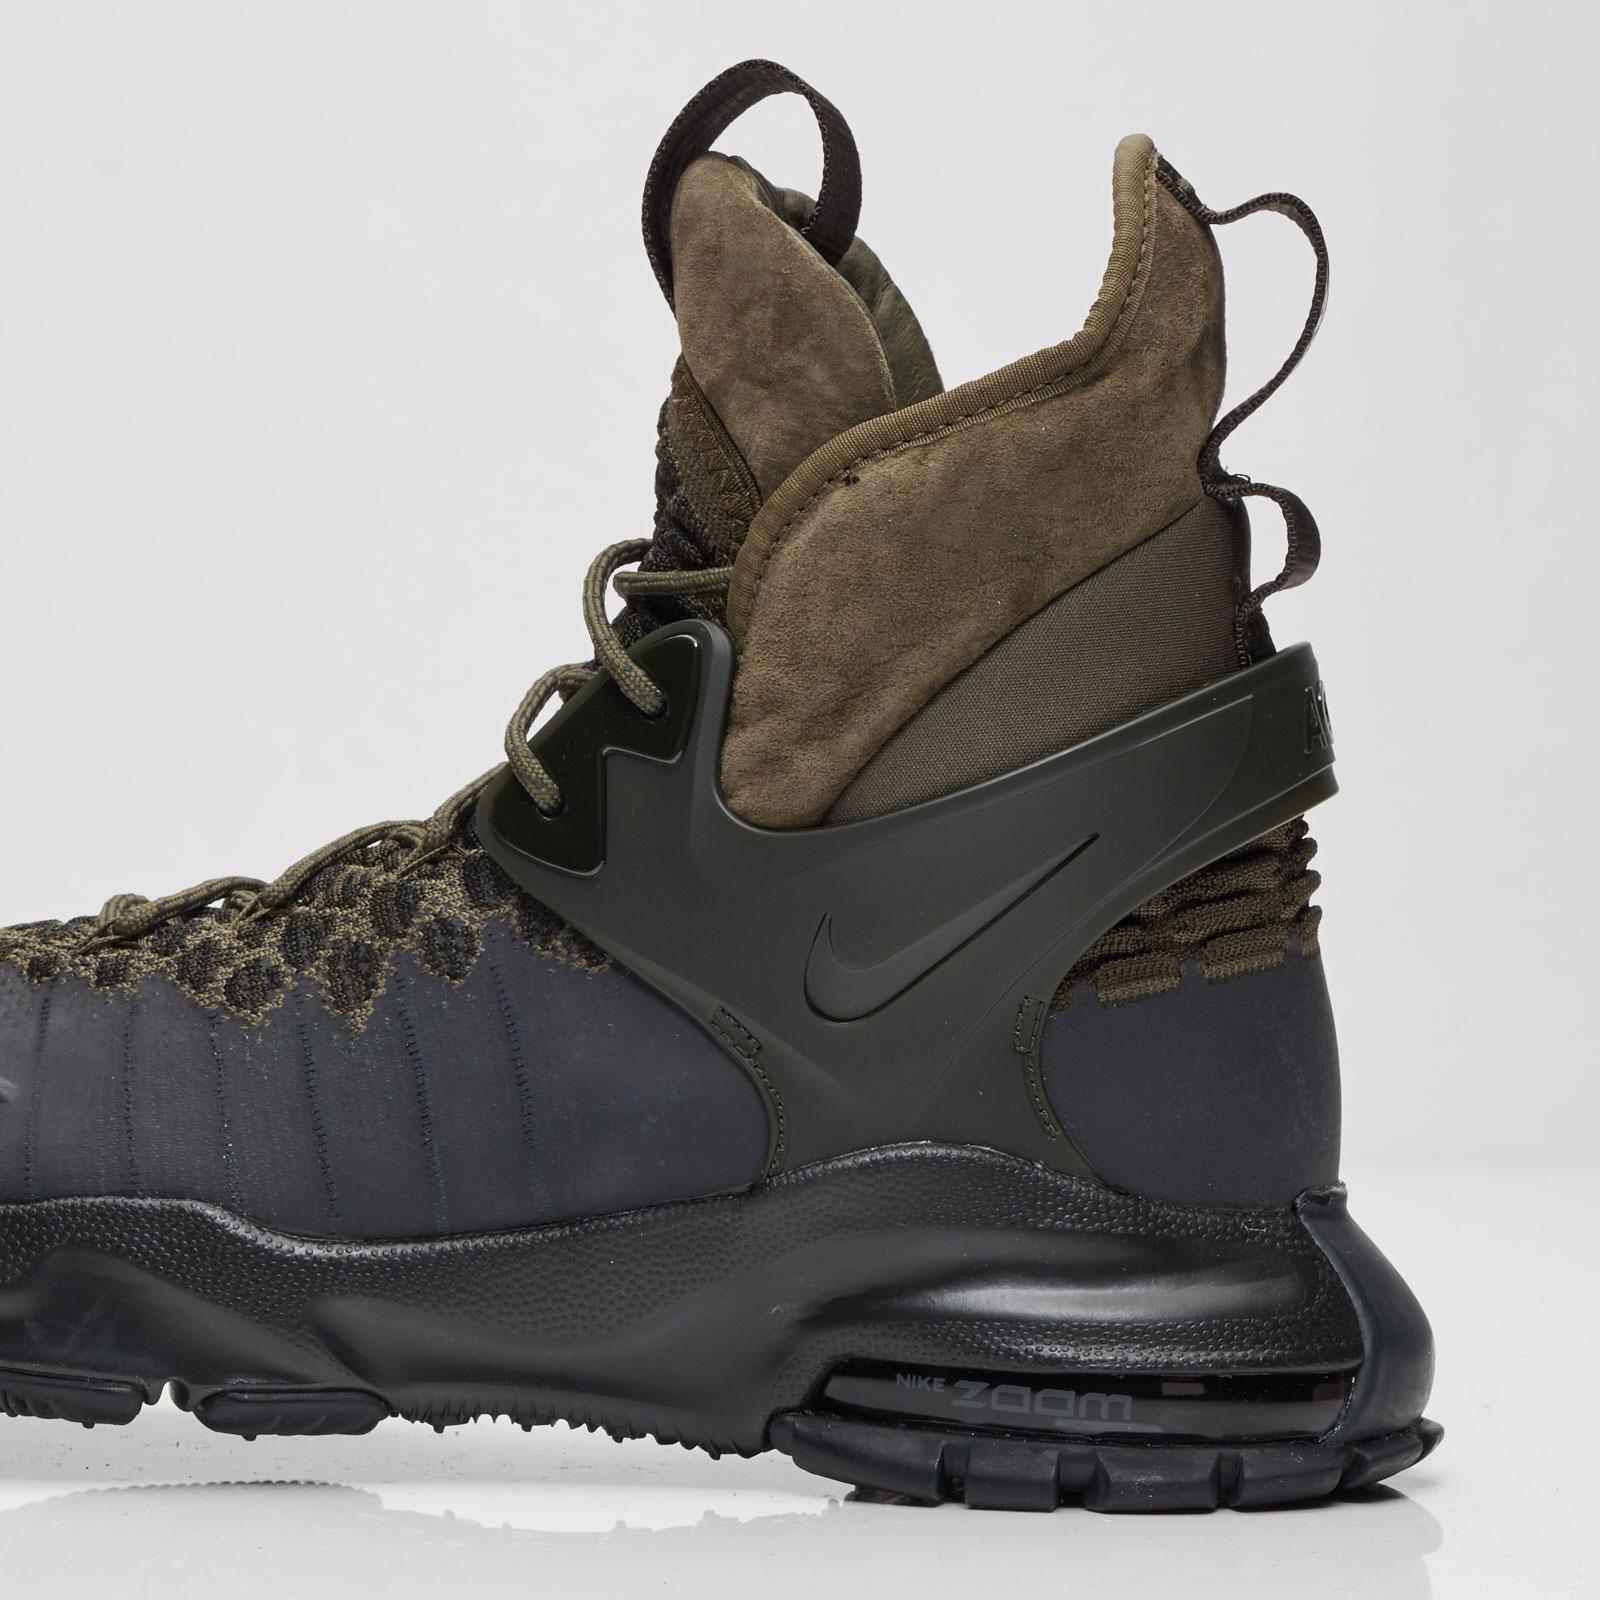 Nike Zoom Tallac Flyknit - 865947-002 - Sneakersnstuff  a26bb89a96b1